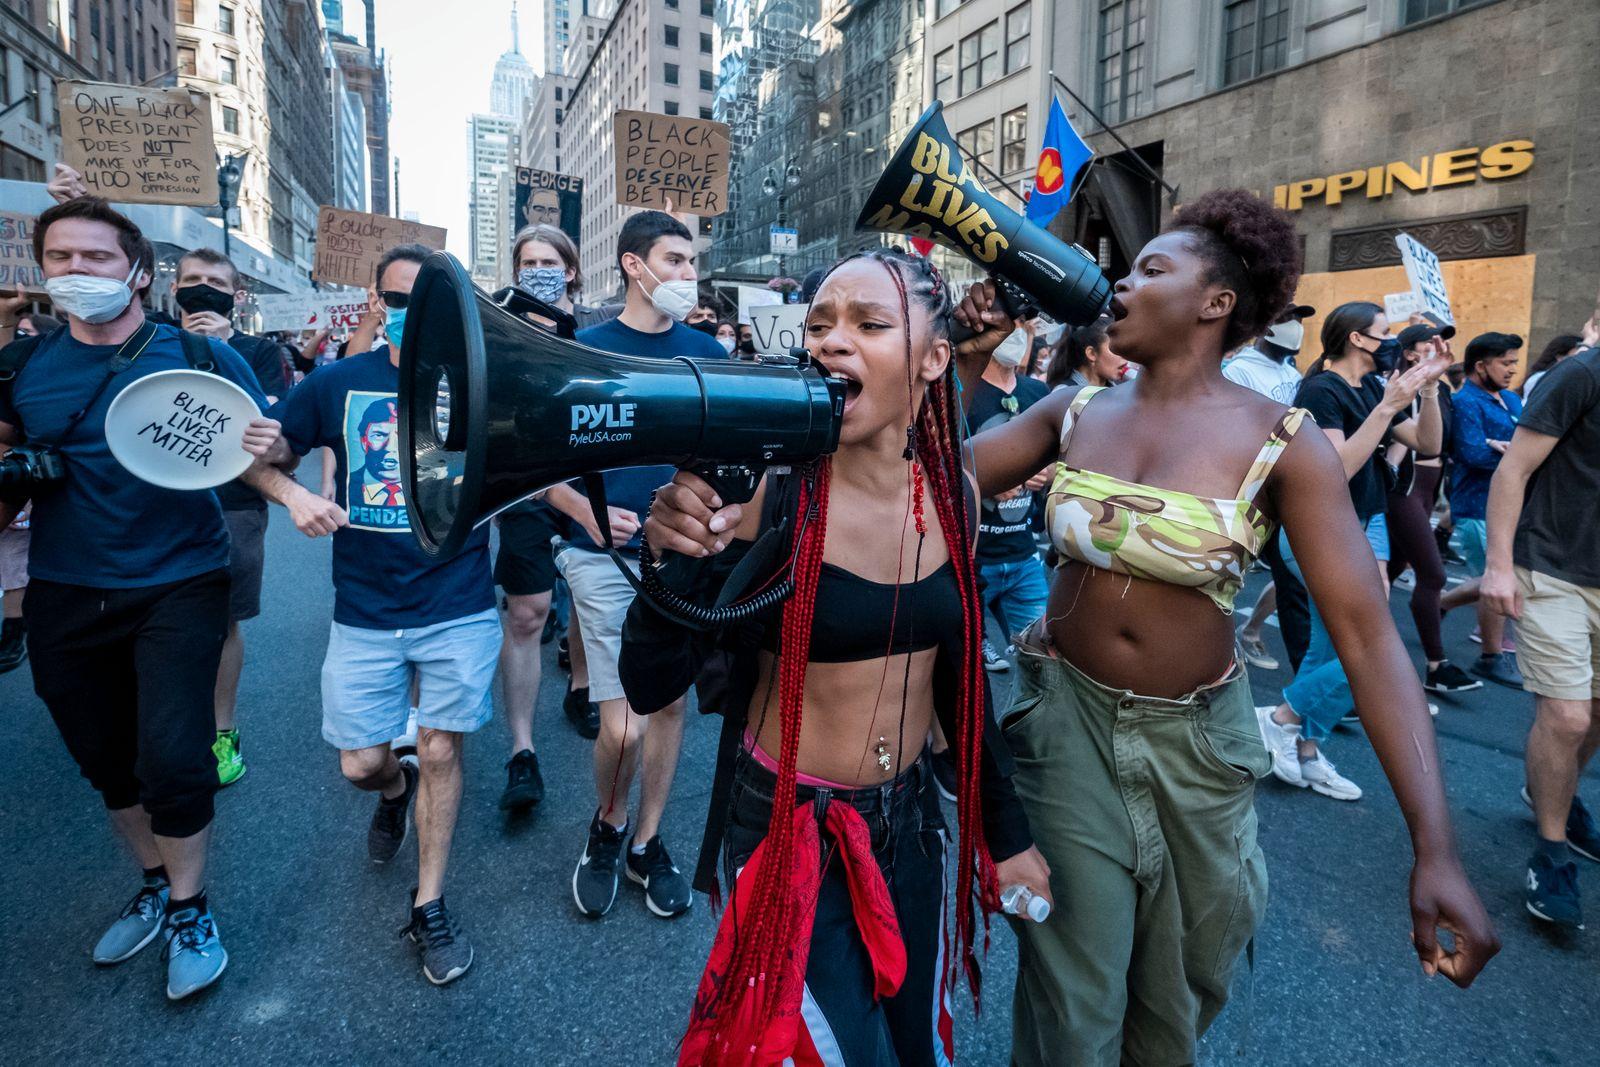 News - George Floyd Protest Donald Trump Birthday Protest - New York City